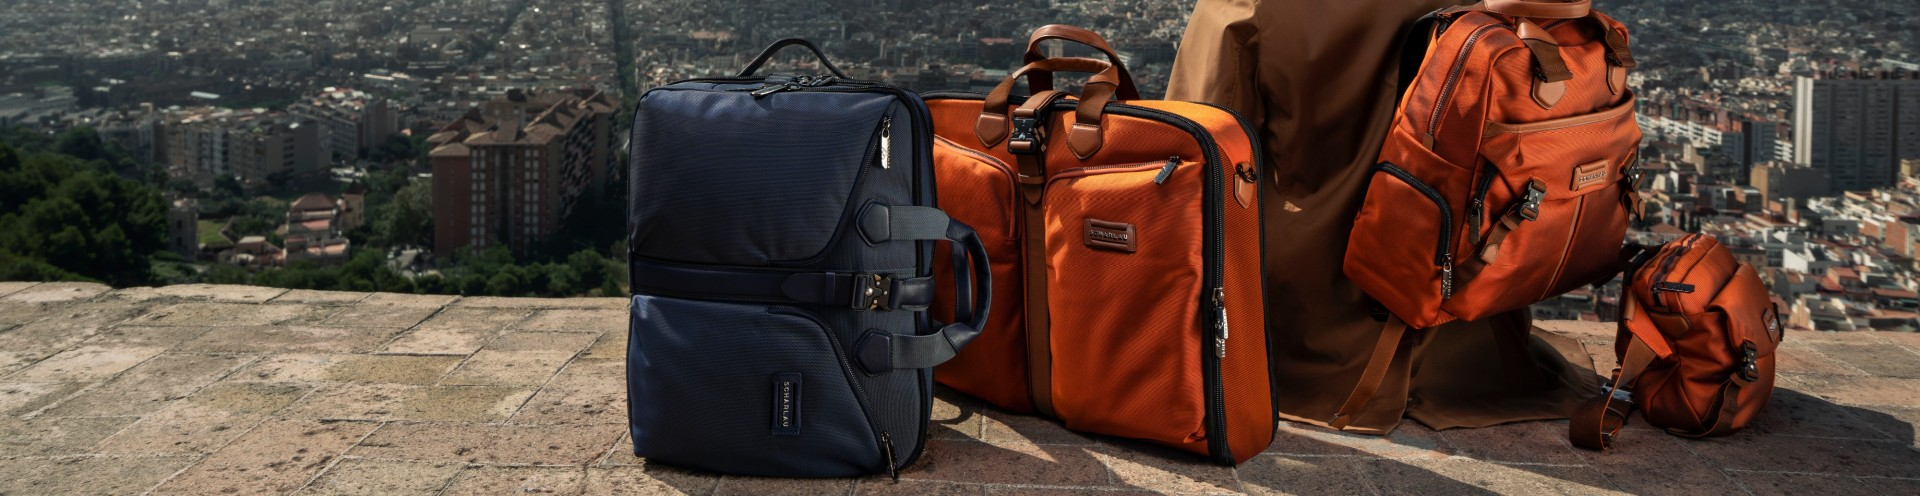 Eleganti Lucchetti elastici per valigie e borse